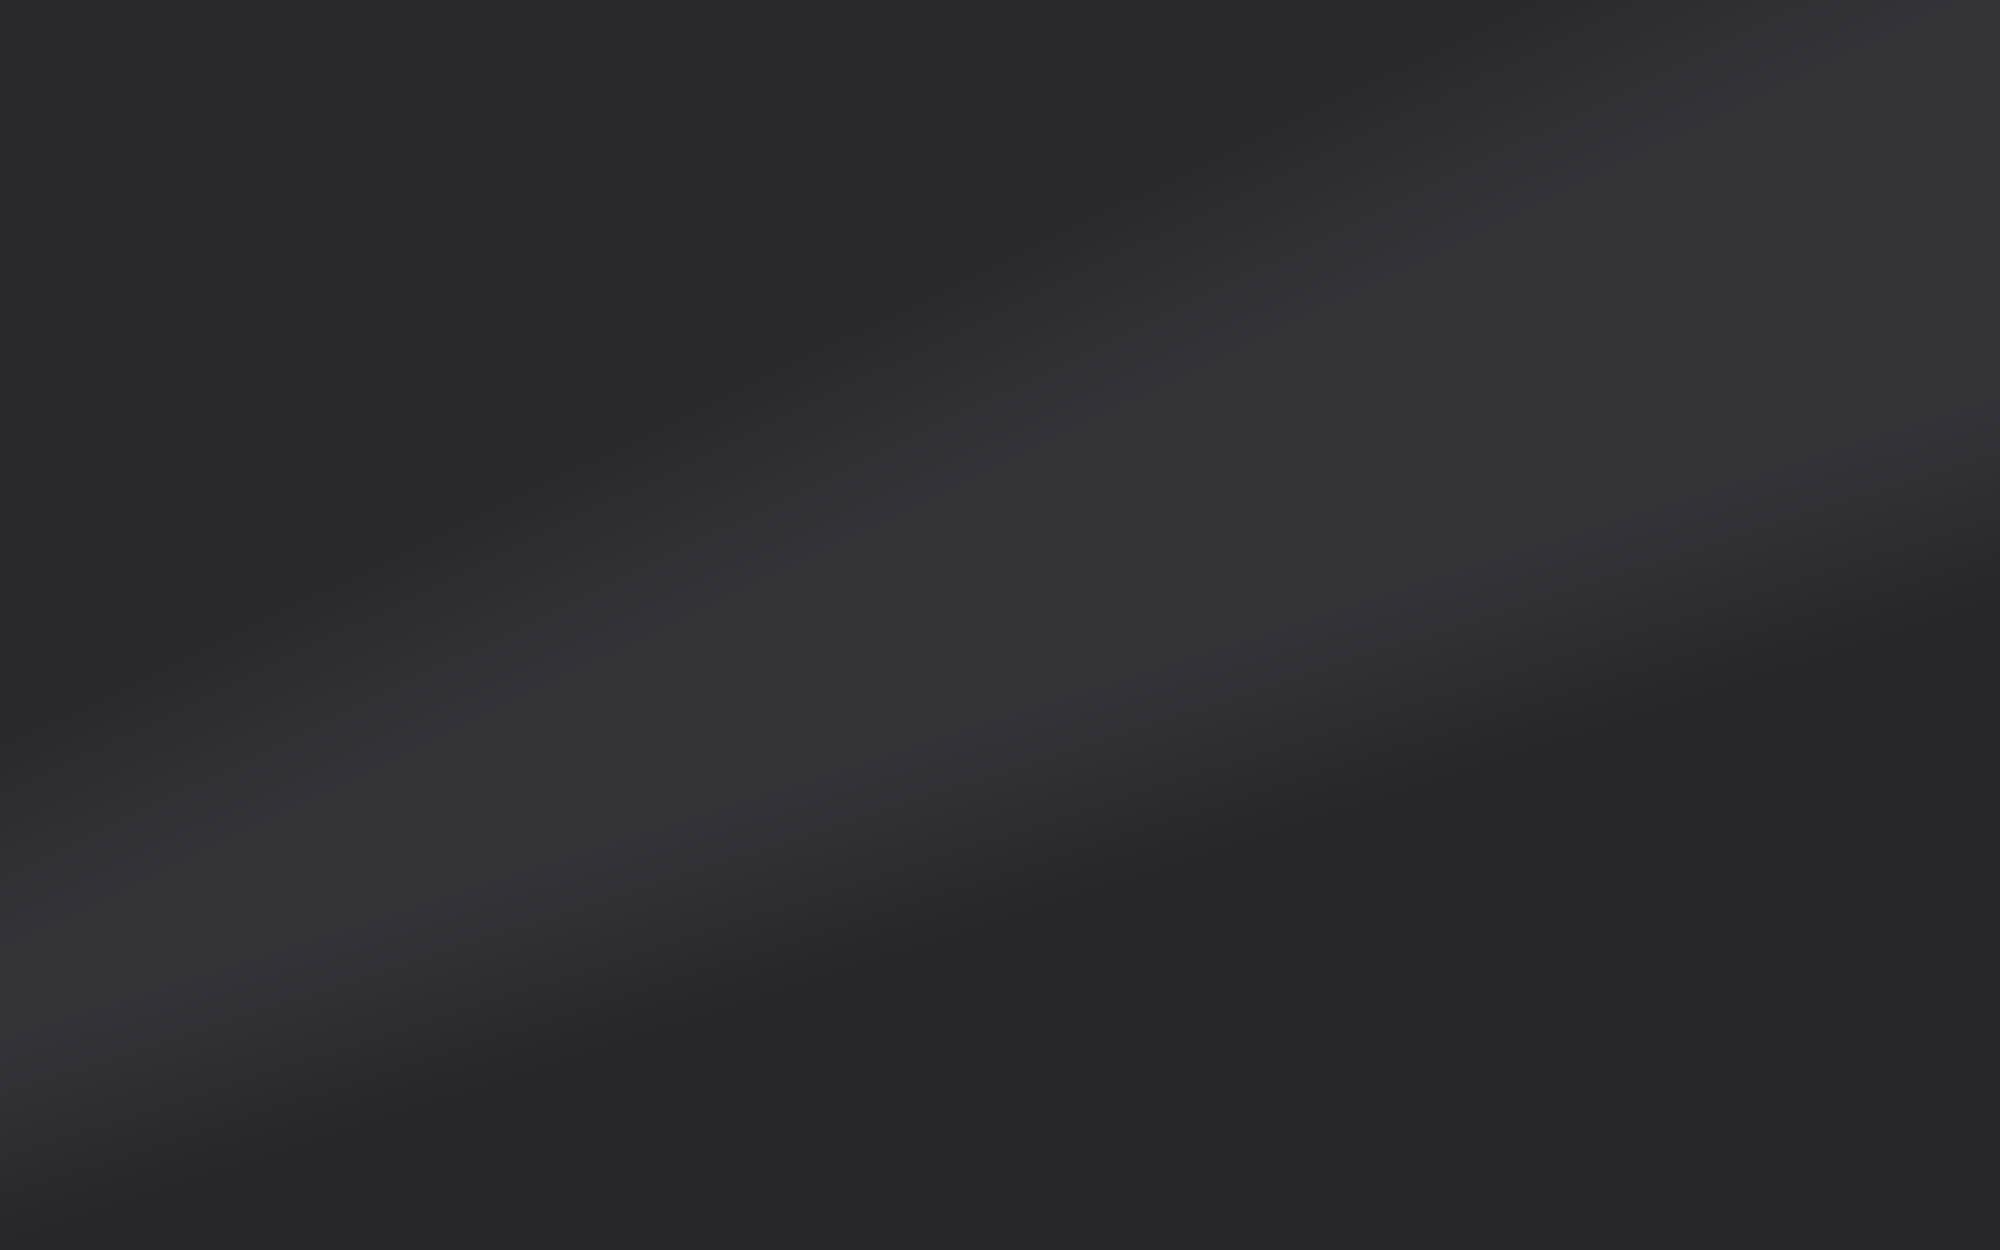 RAL 7021 black grey / high gloss finish